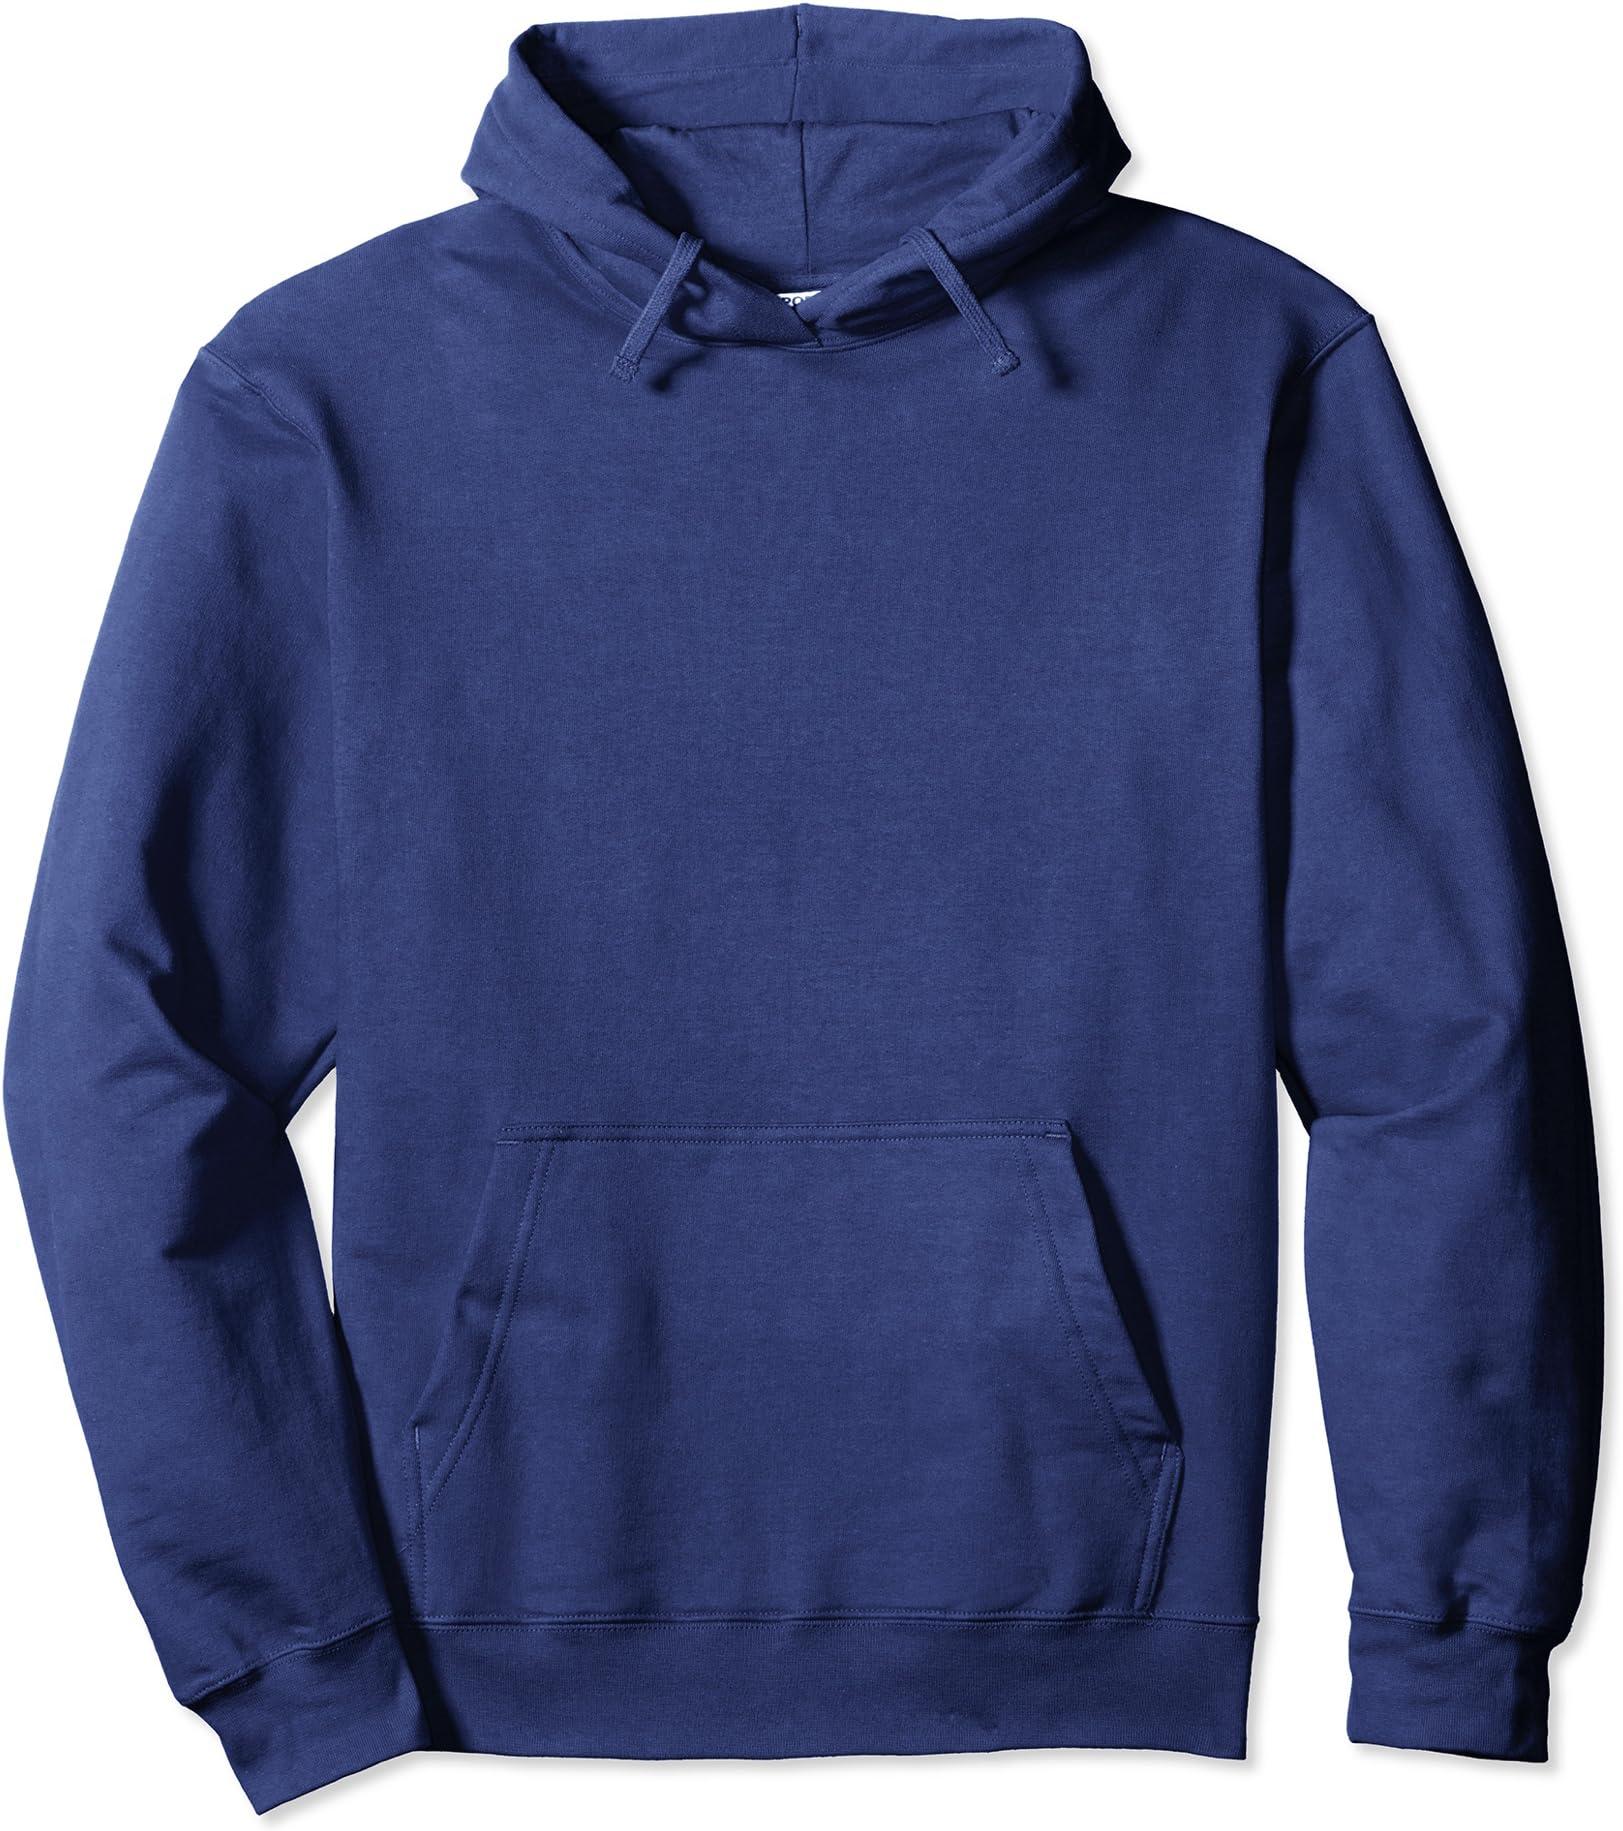 Gamer Retro Vintage Unisex Hoodie Sweatshirt Classically Trained